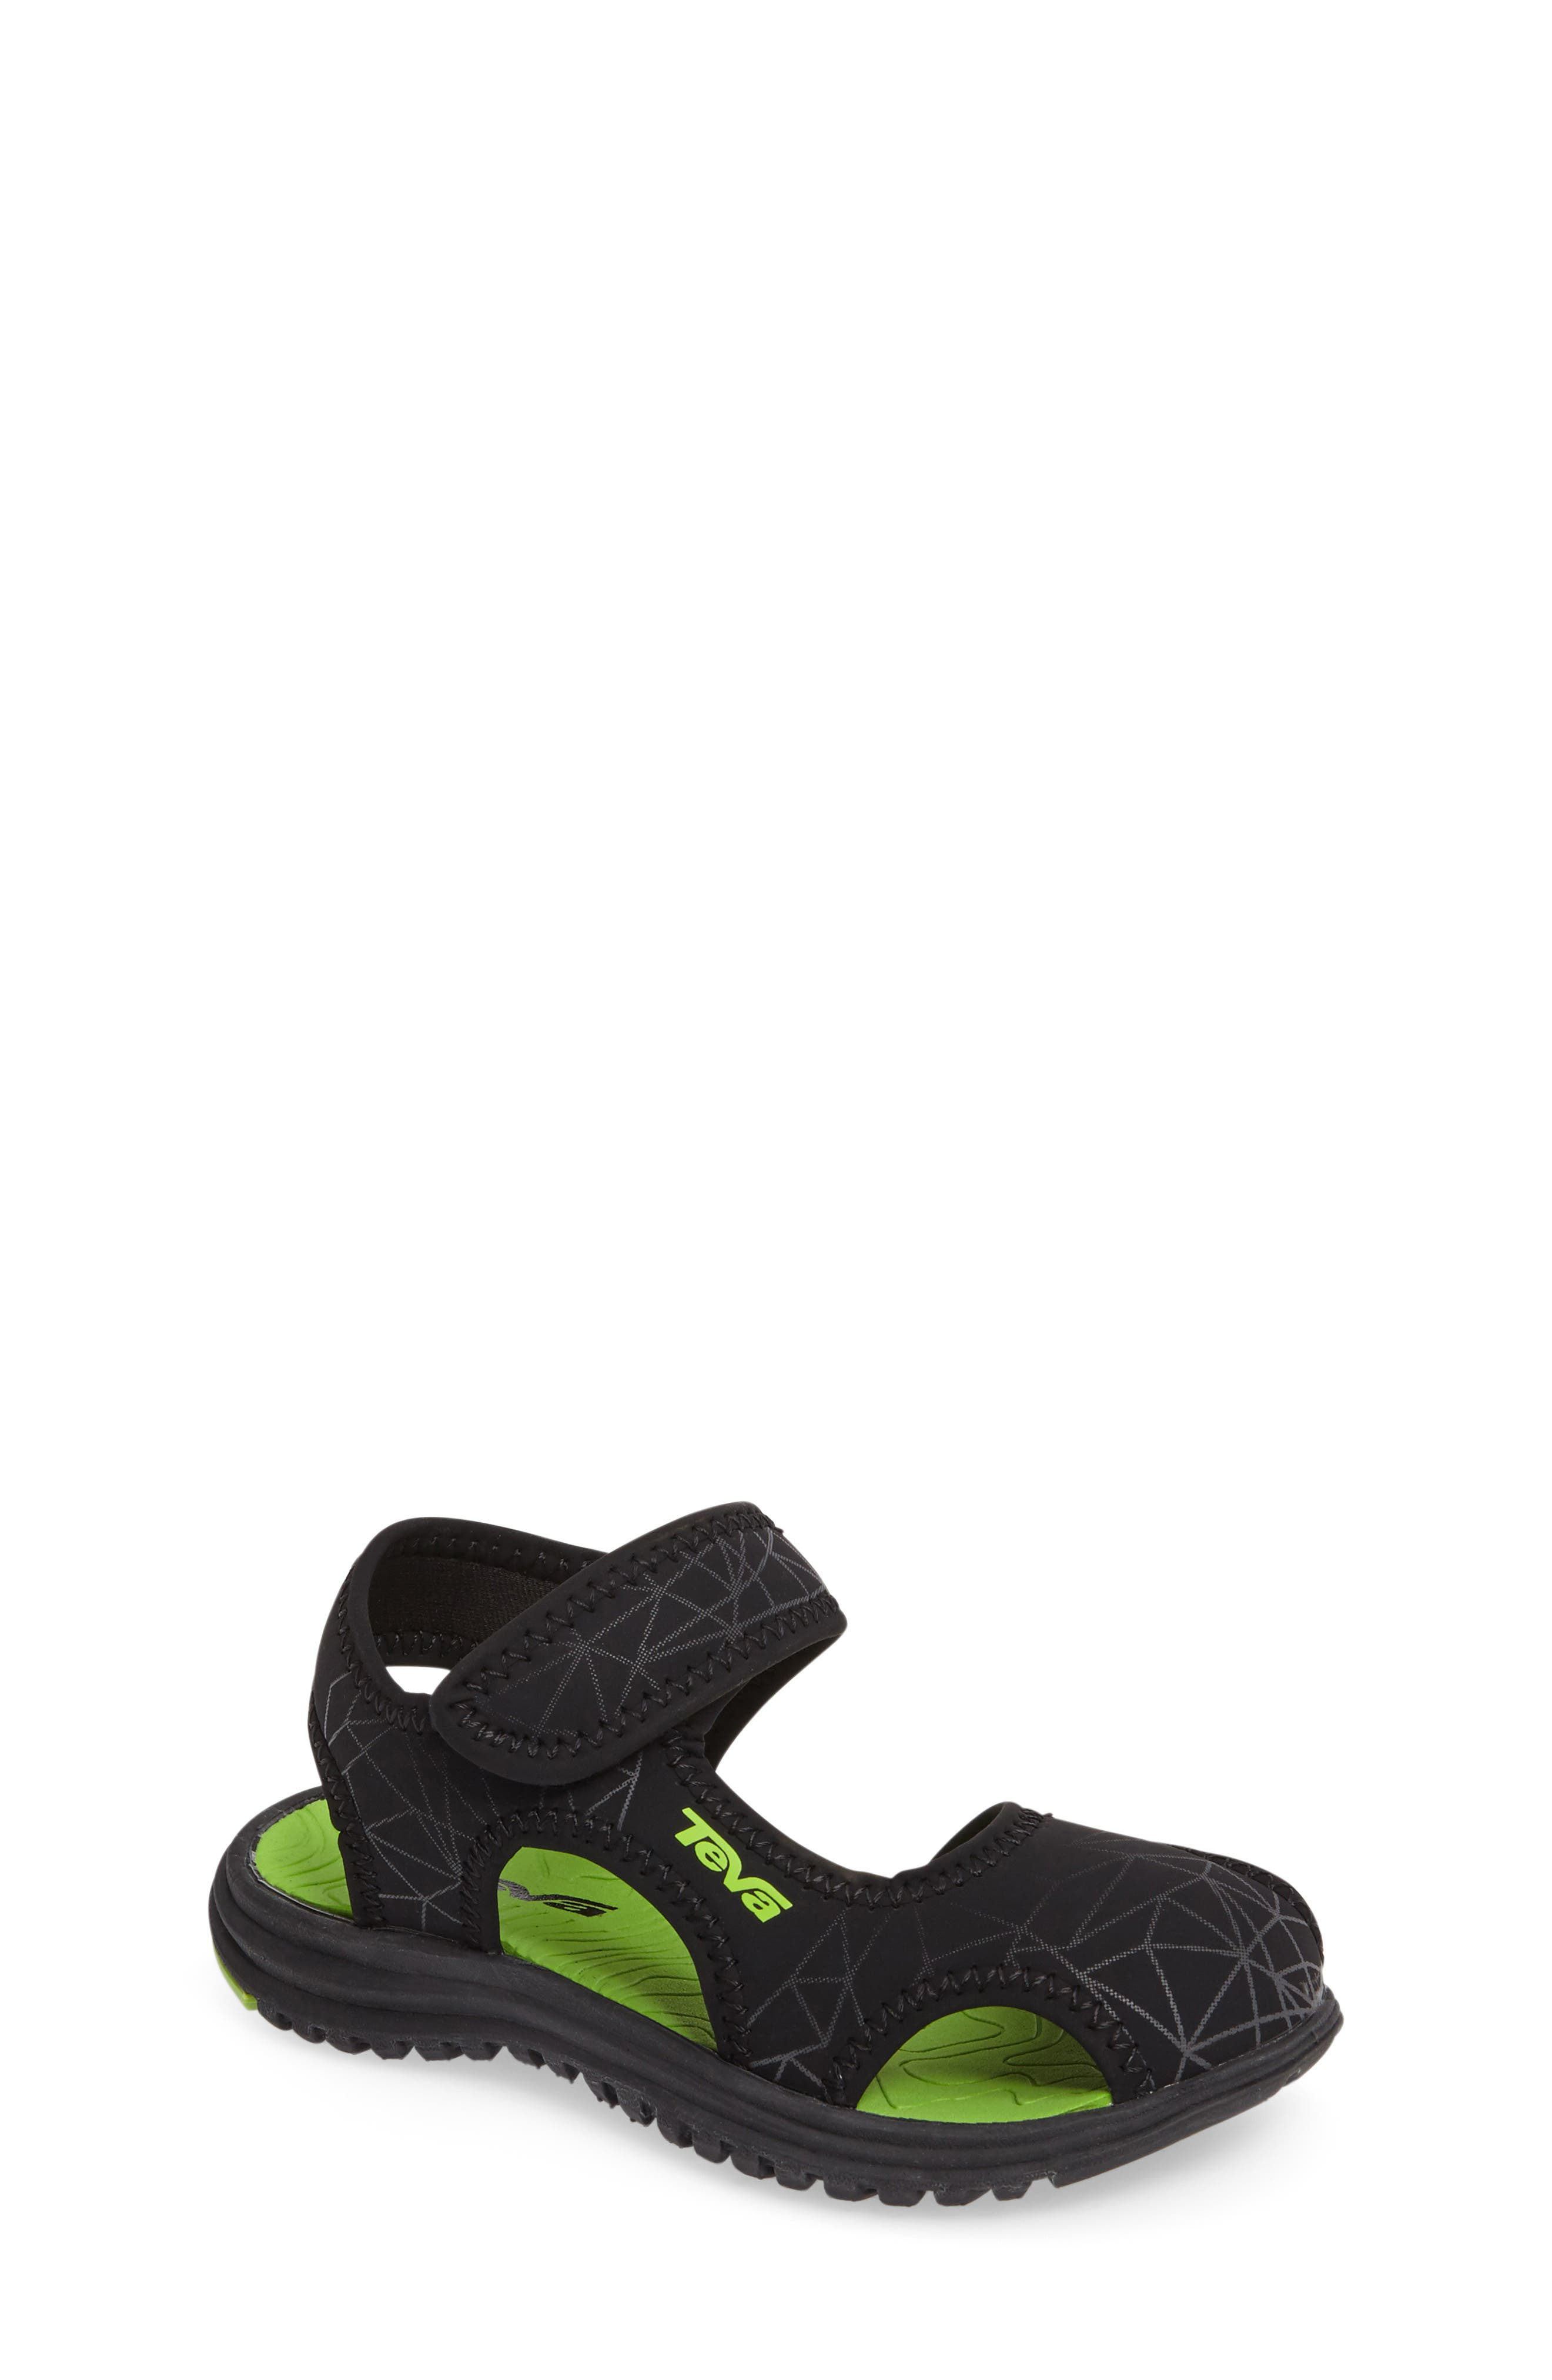 TEVA Tidepool Water Sandal